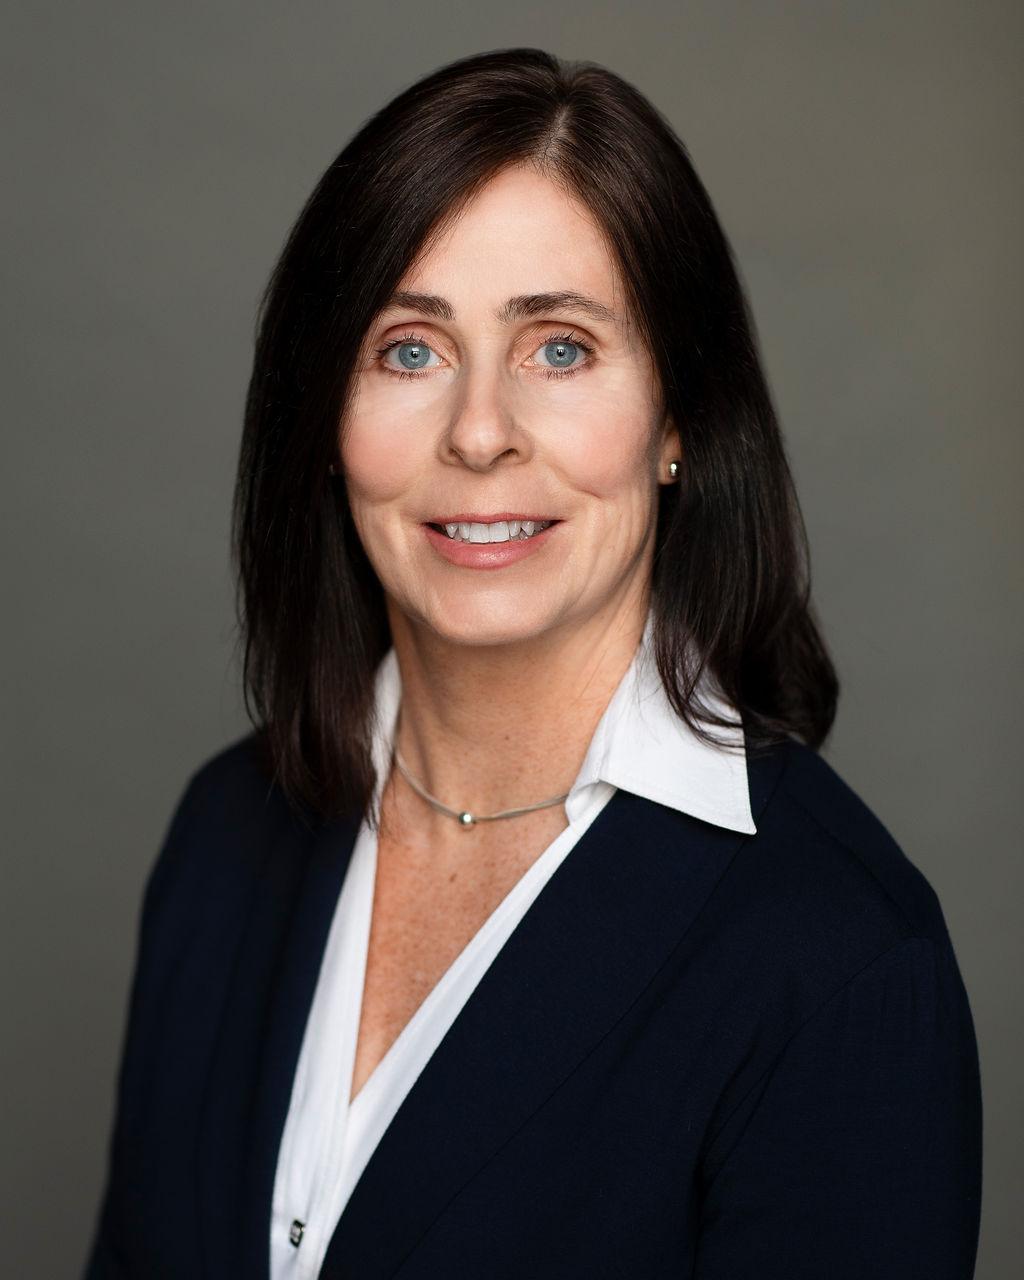 Fiona Roy, President